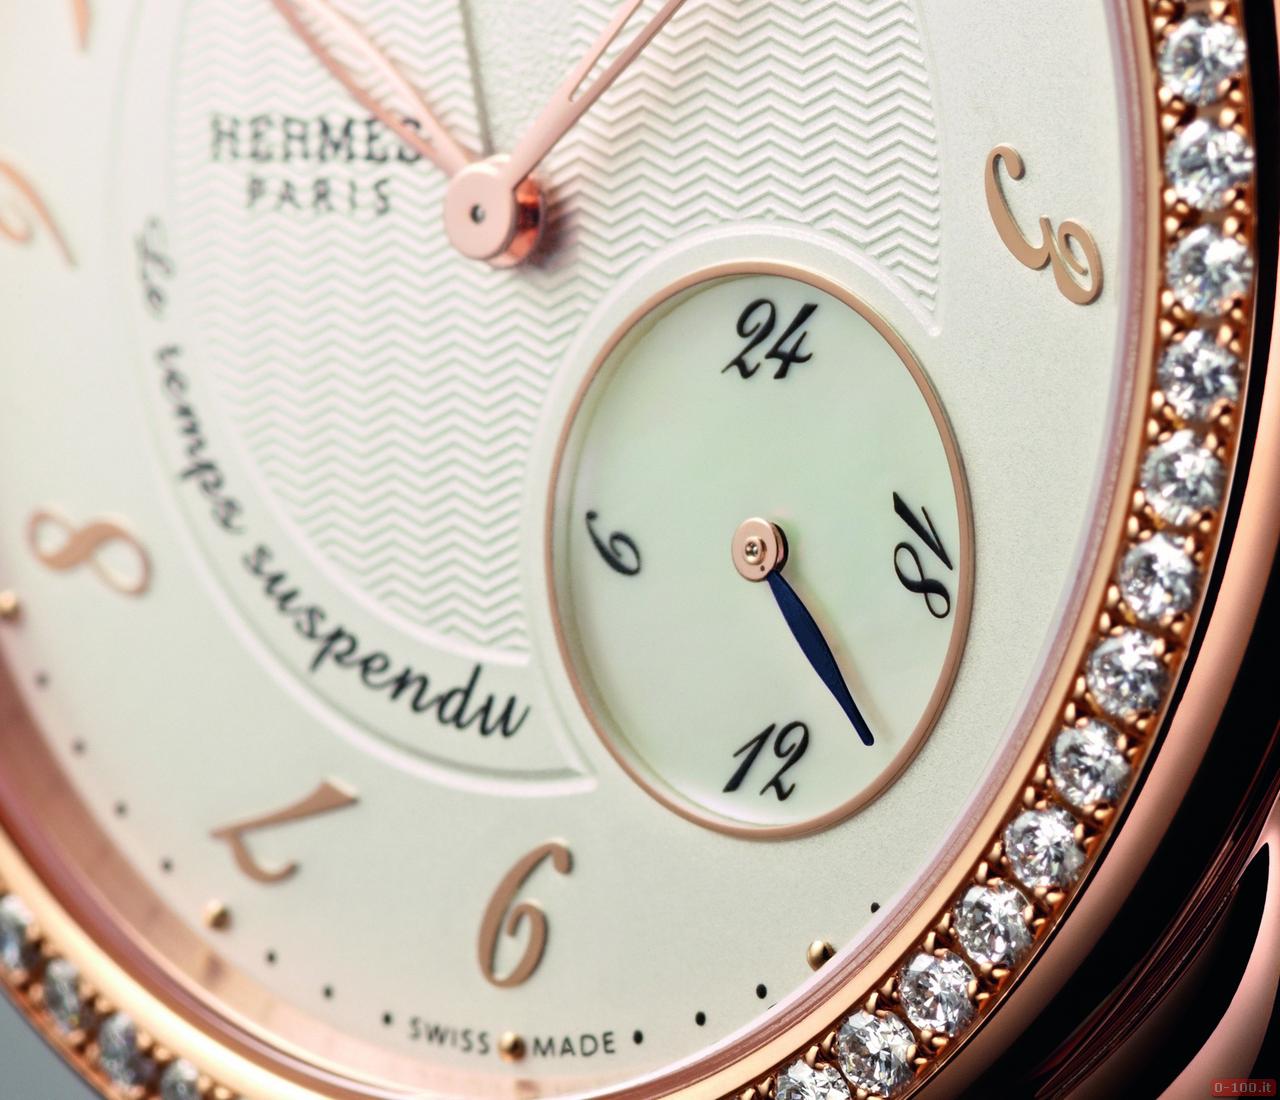 baselworld-2013-hermes-arceau-le-temps-suspendu_0-100_1